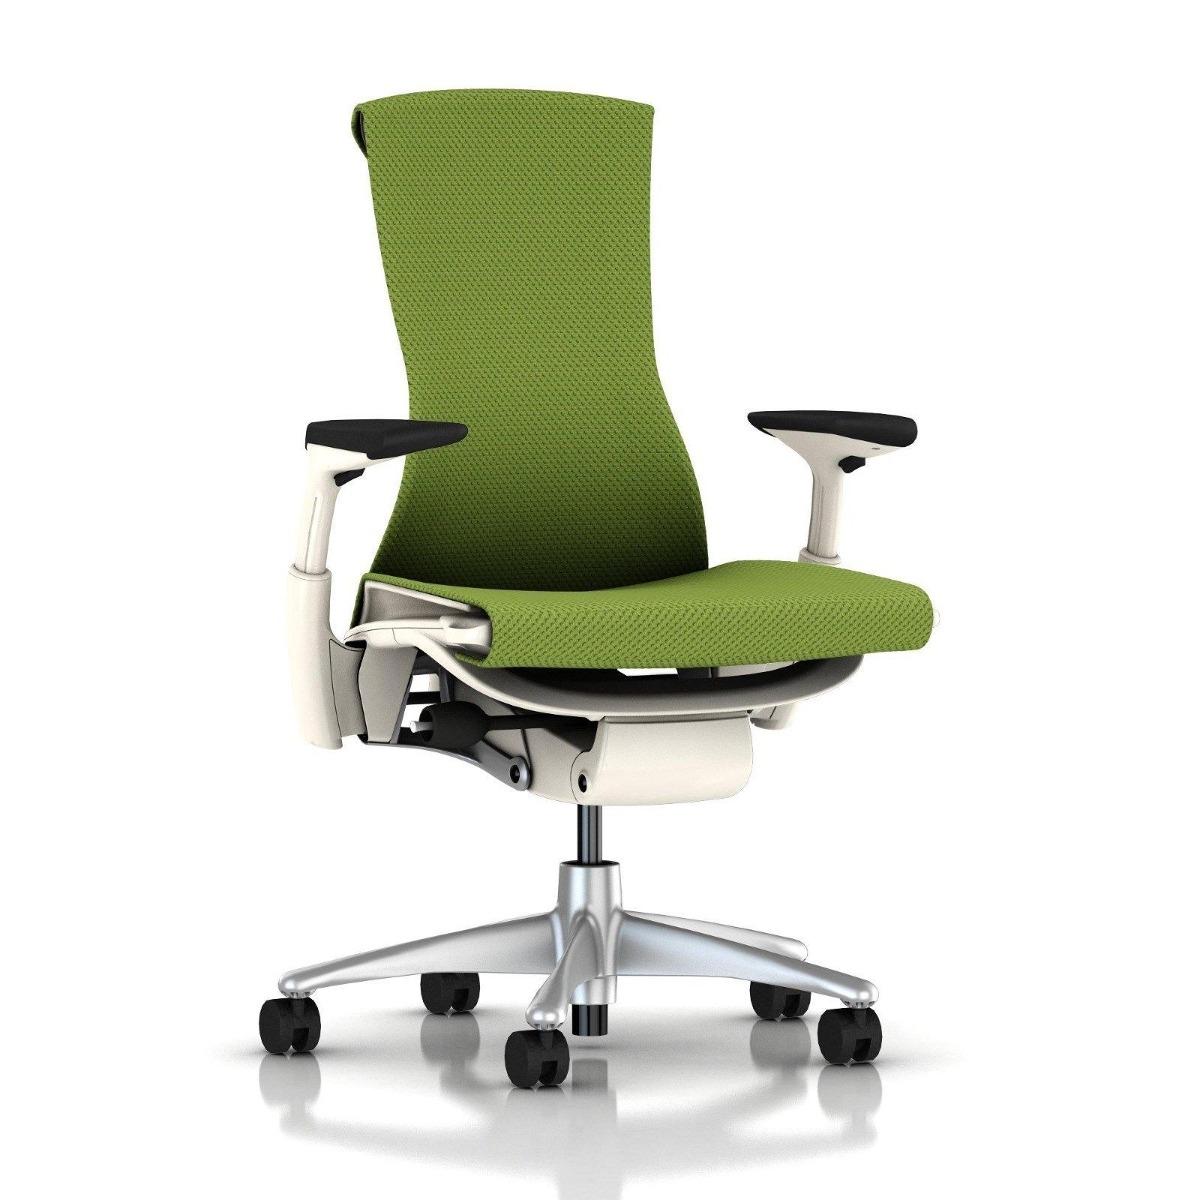 Herman miller embody silla ergonomica para escritorio u for Sillas cajeras ergonomicas